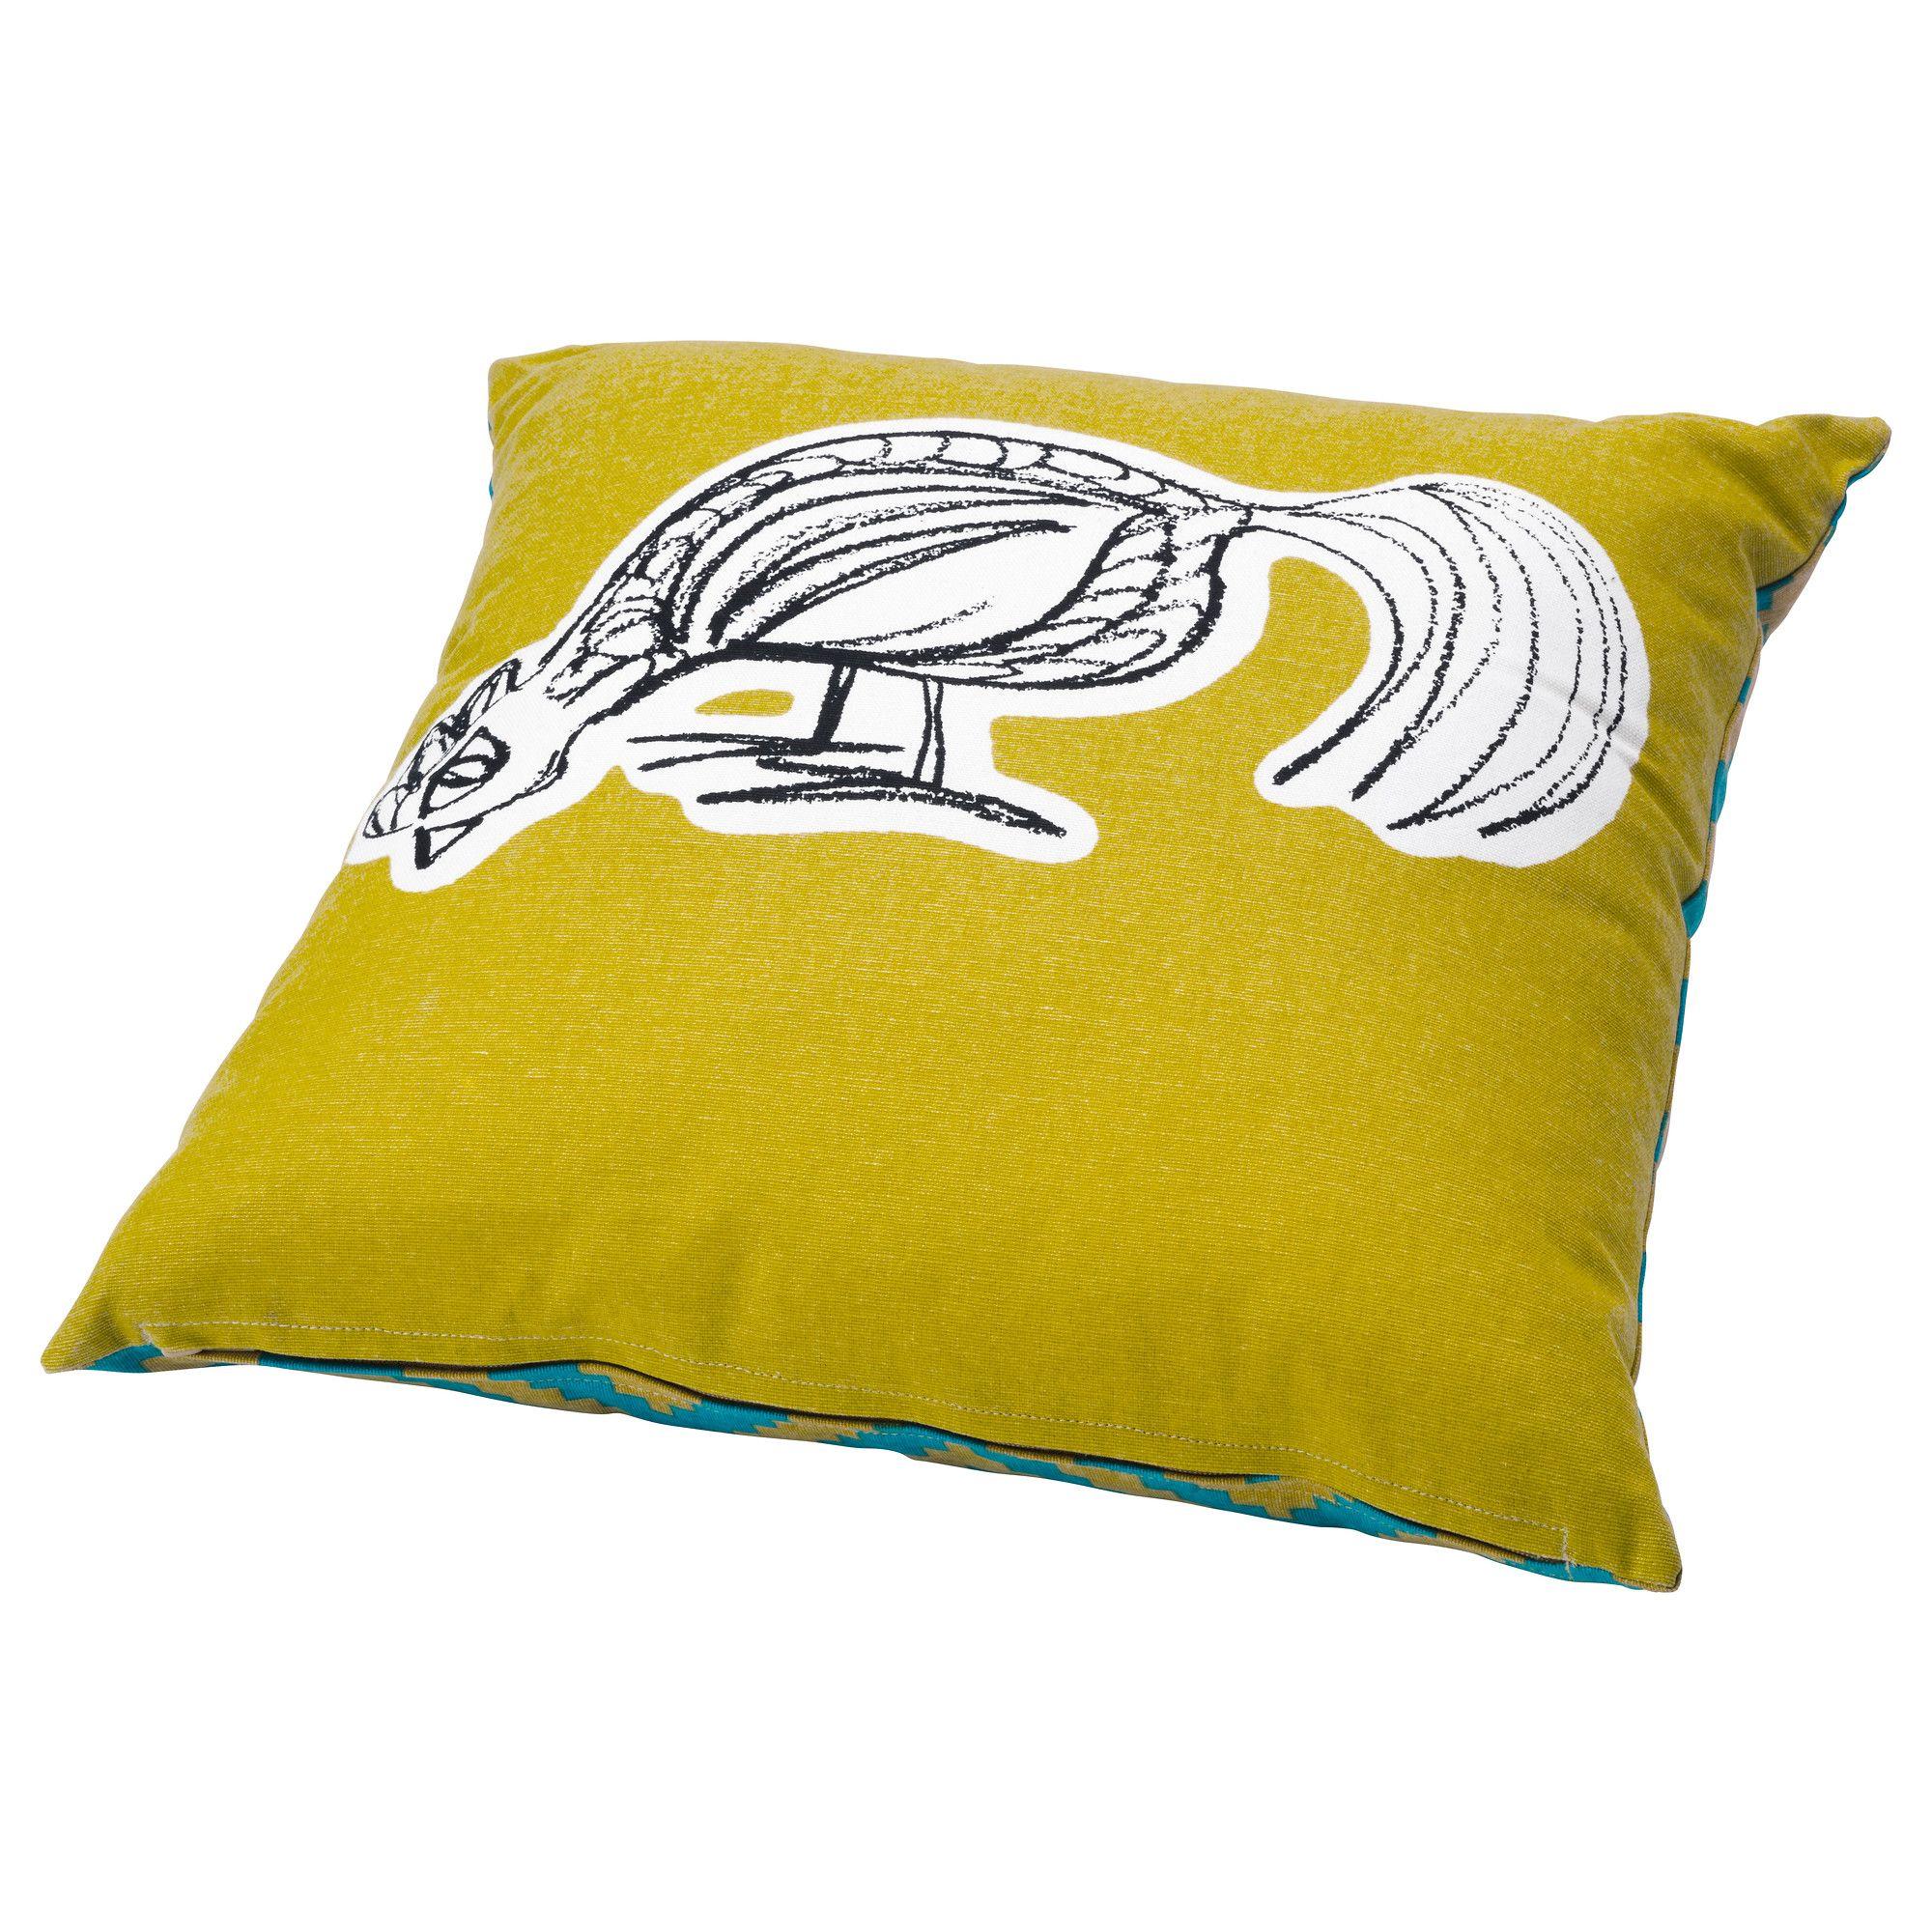 us  furniture and home furnishings  cushions ikea